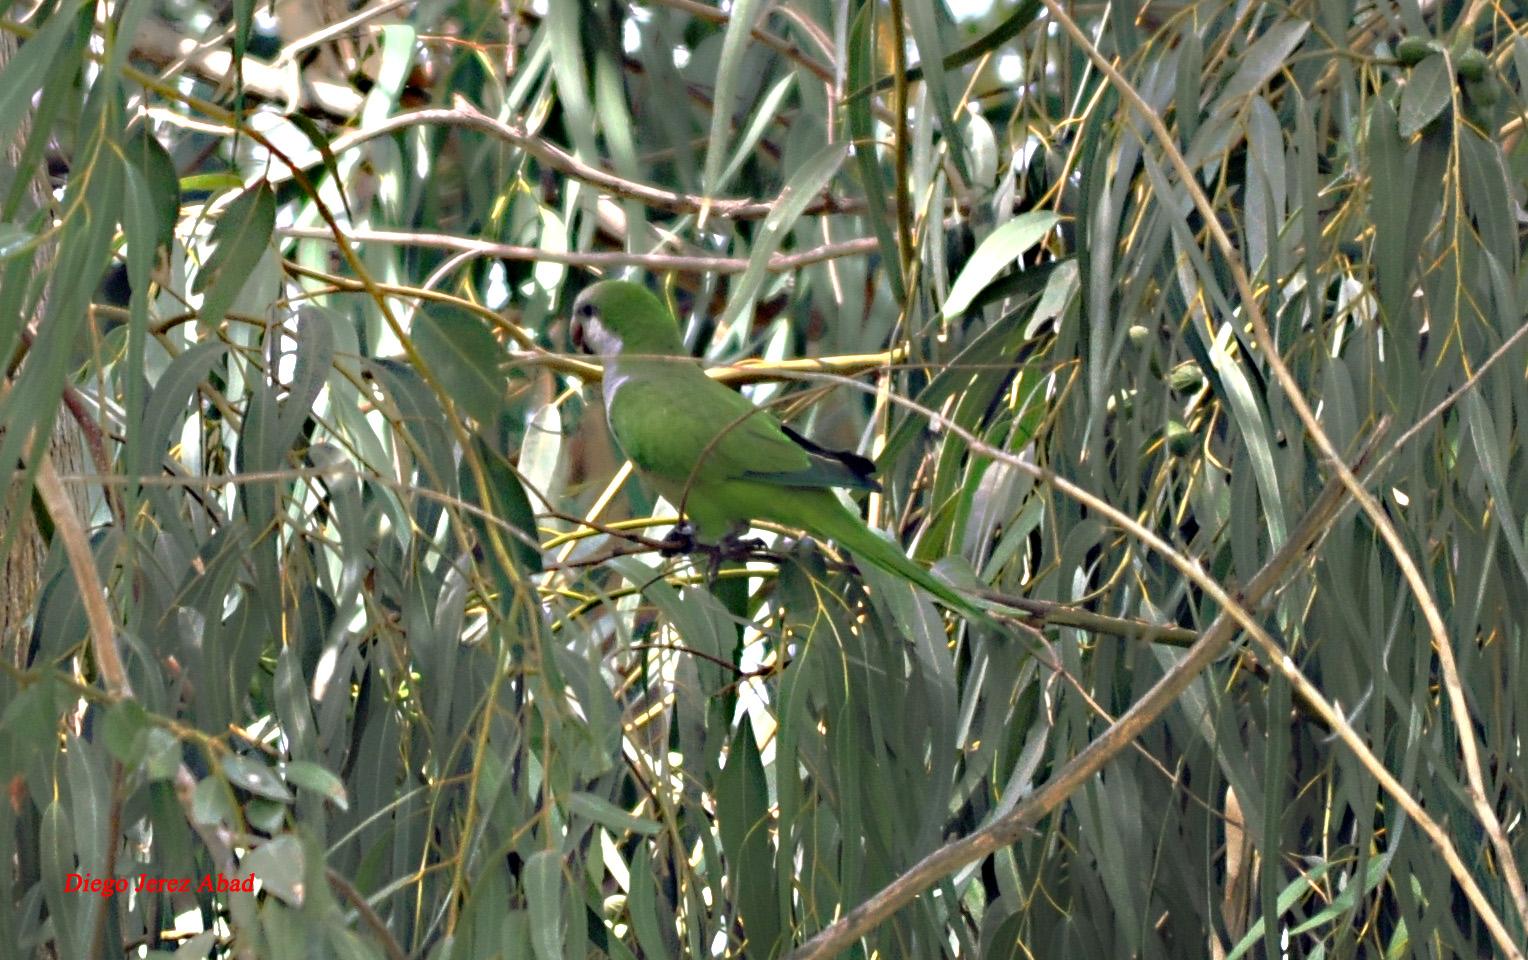 Monk Parakeet / Conure veuve (Myiopsitta monachus), Melilla, 13 Aug. 2012 (Diego Jerez Abad).